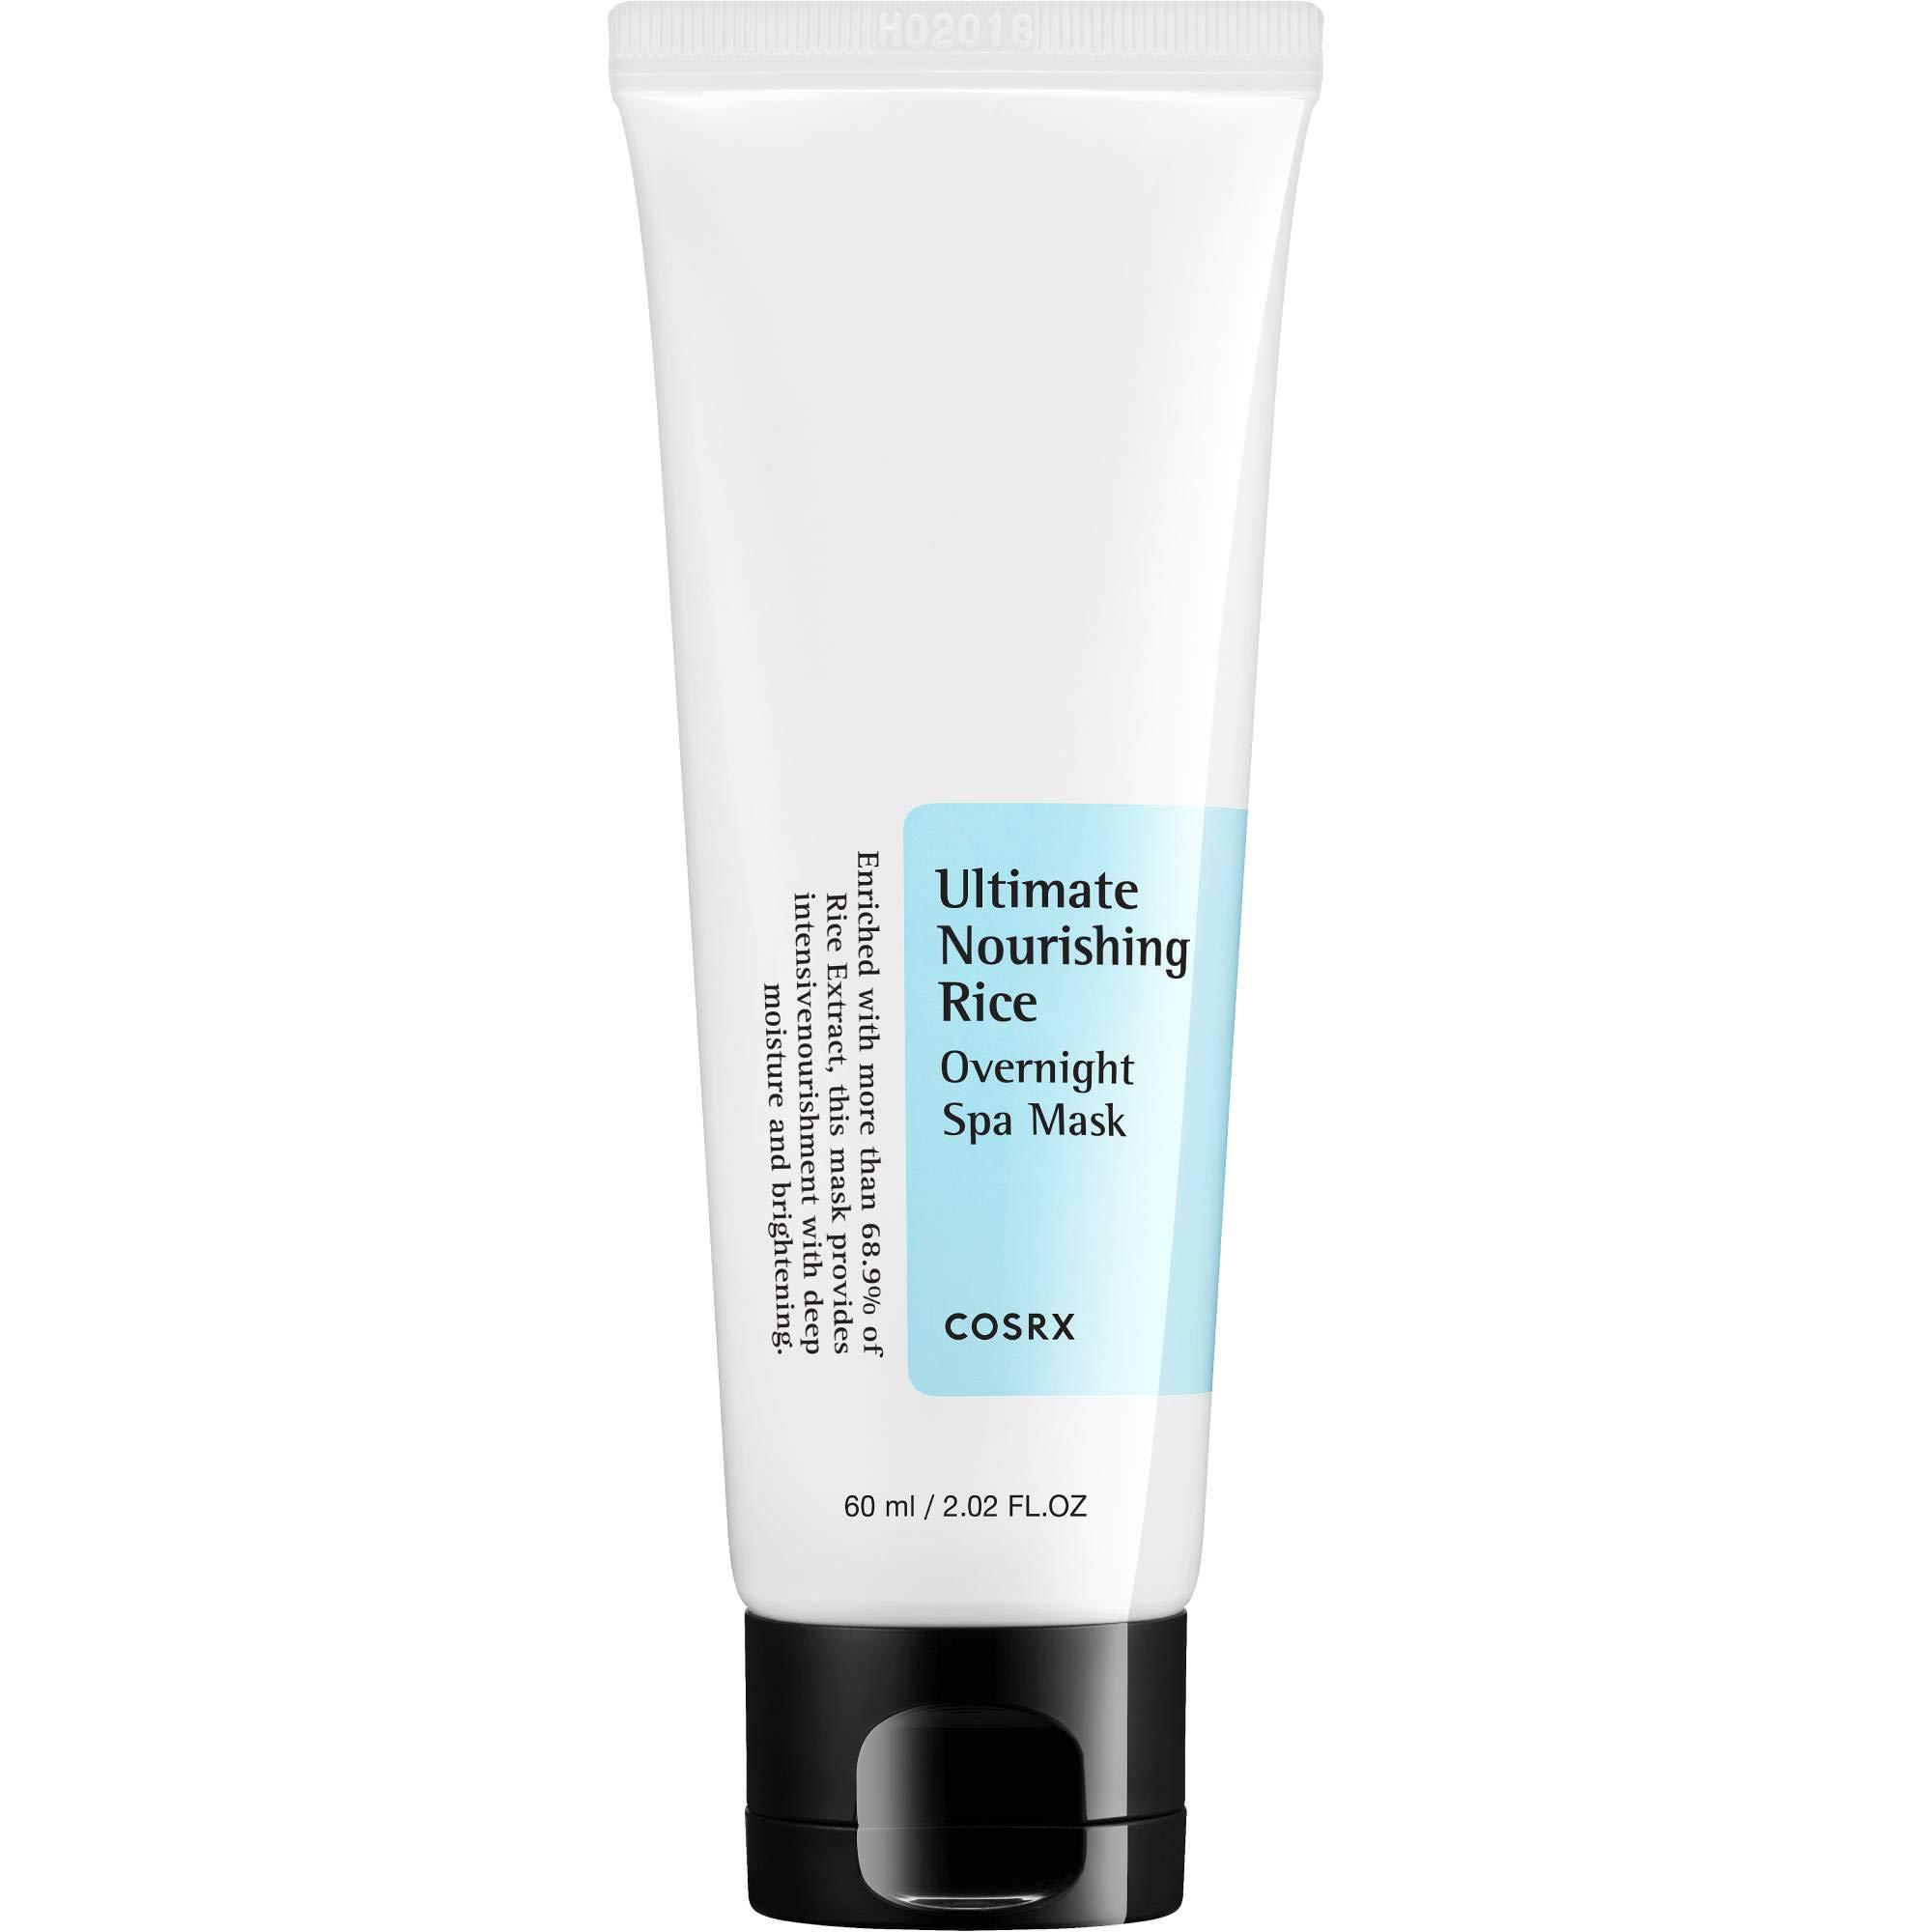 COSRX Ultimate Nourishing Rice Overnight Spa Mask, 60ml / 2.02 fl.oz | Rice Extract 68% | Korean Skin Care, Vegan, Cruelty Free, Paraben Free